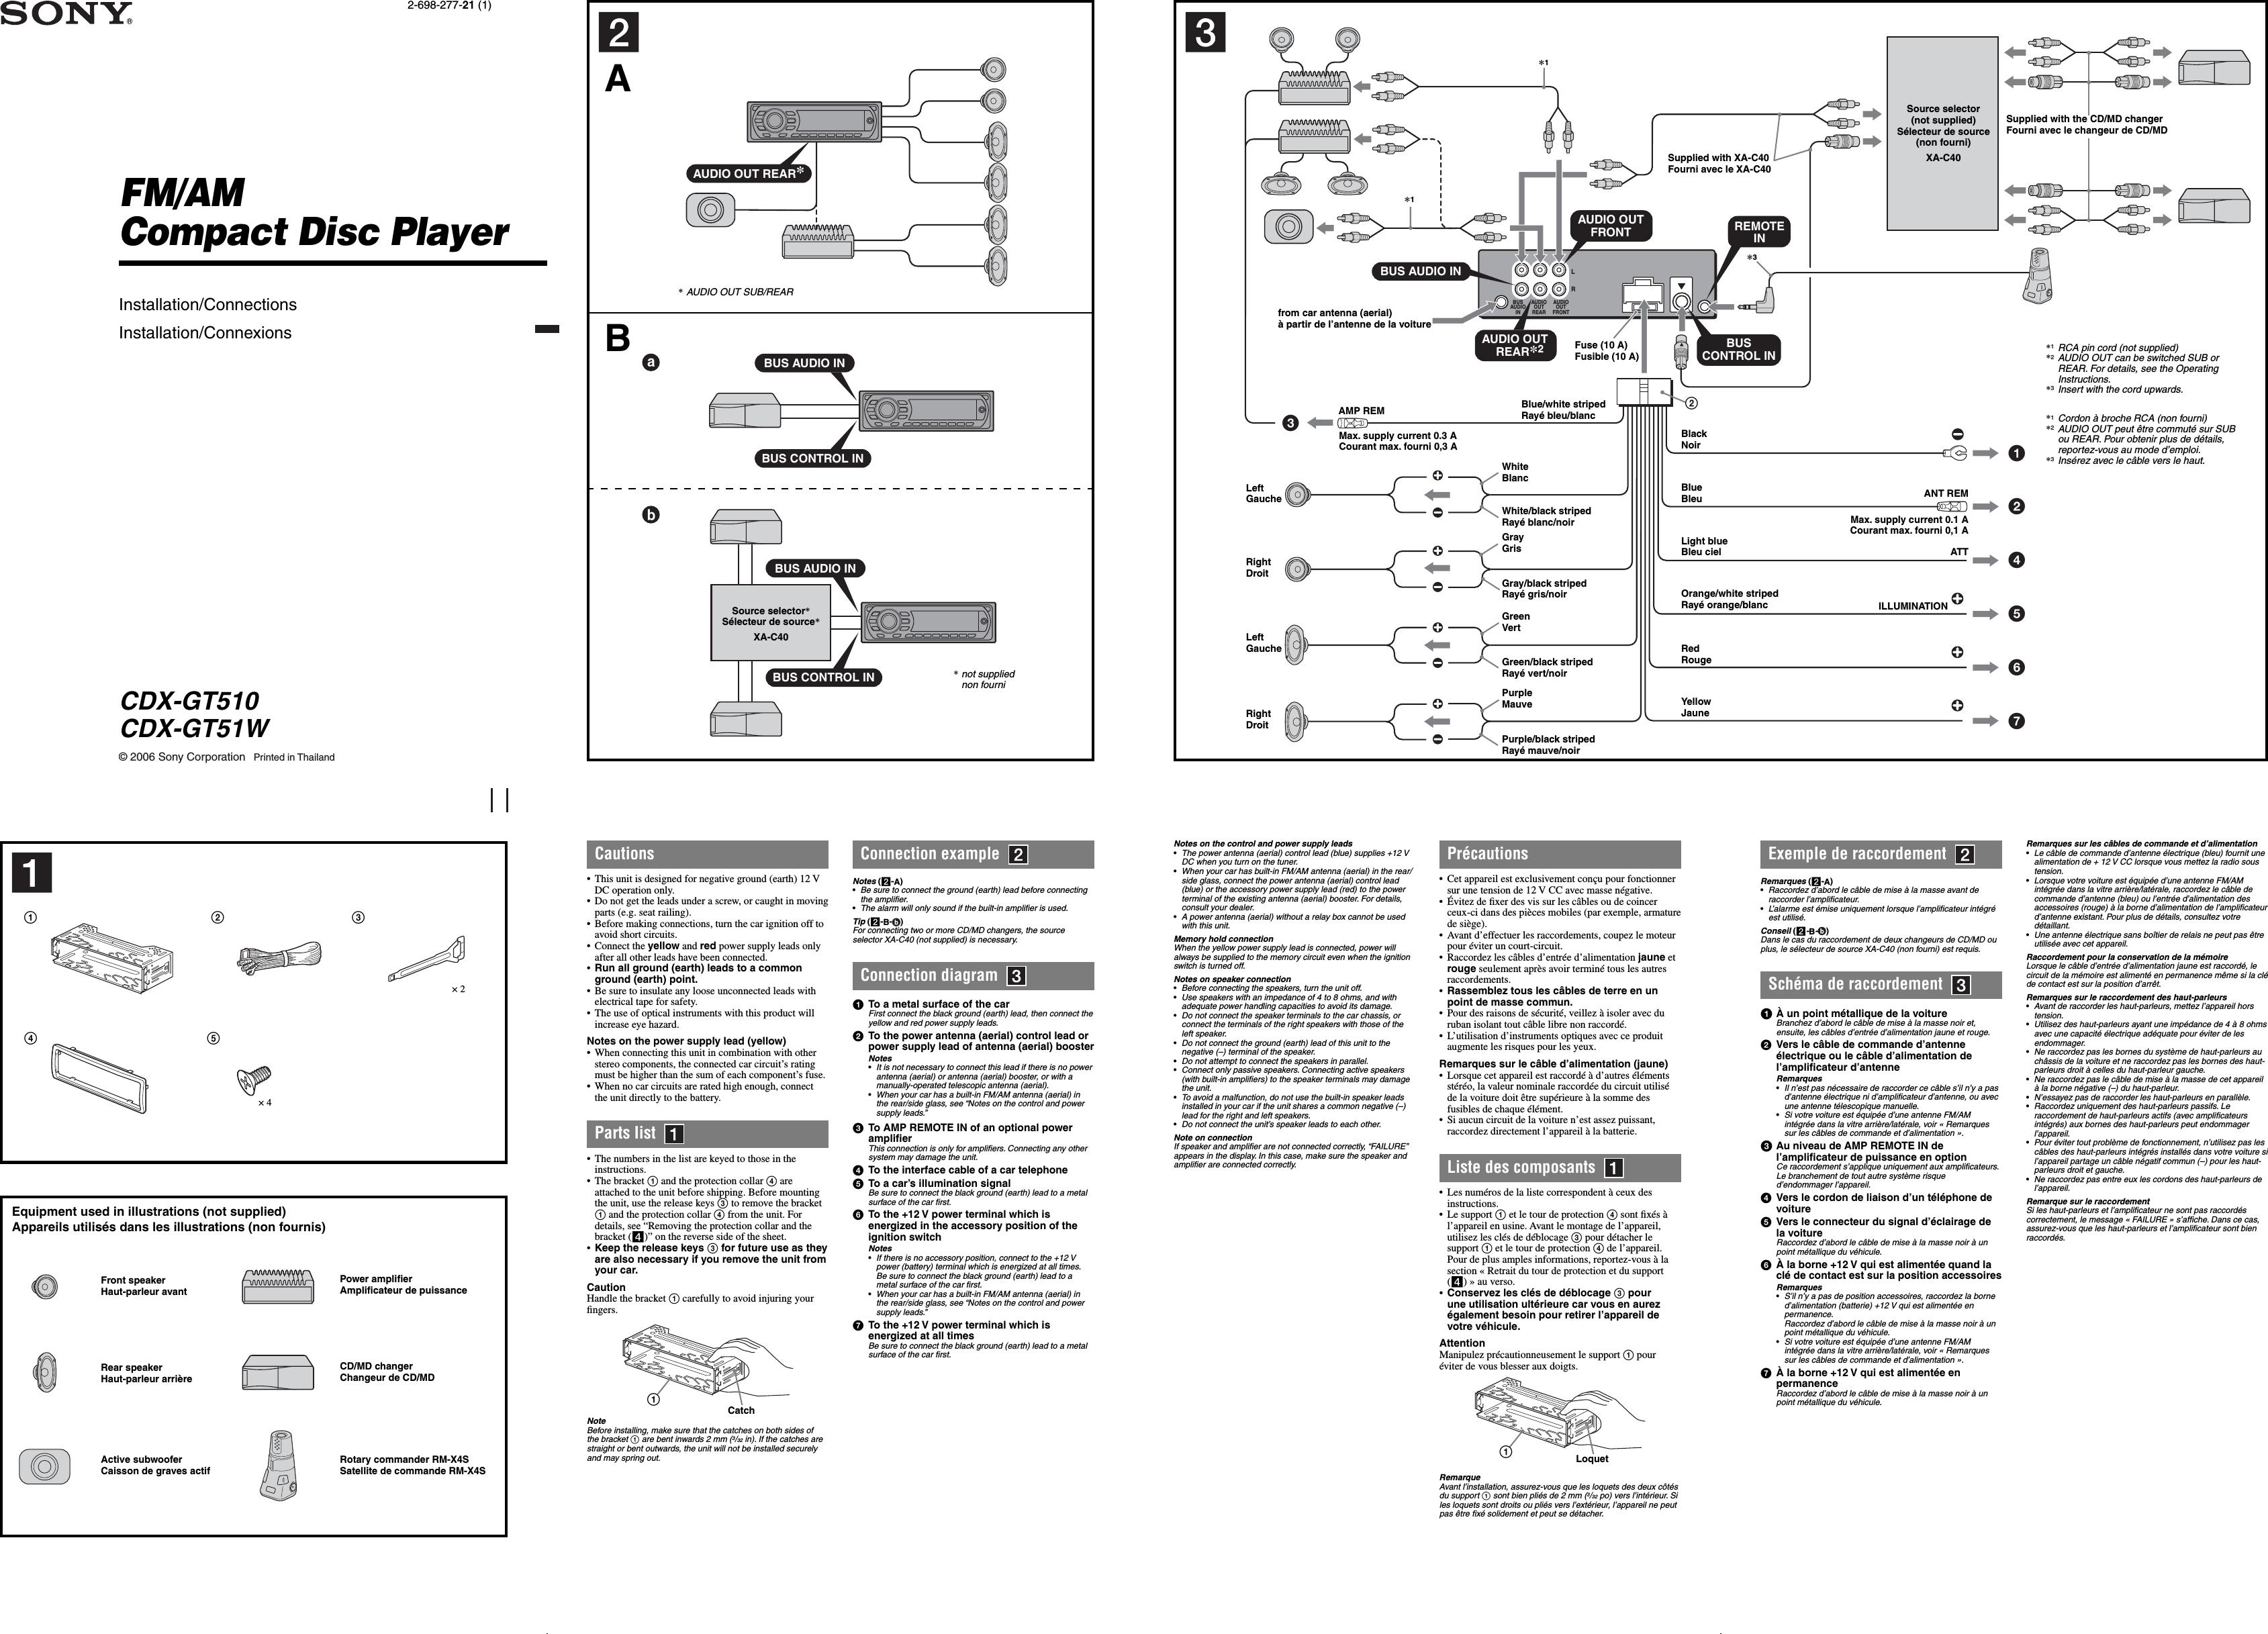 CH_7800] Sony Cdx Gt240 Wiring Diagram Download DiagramOmit Lotap Mohammedshrine Librar Wiring 101